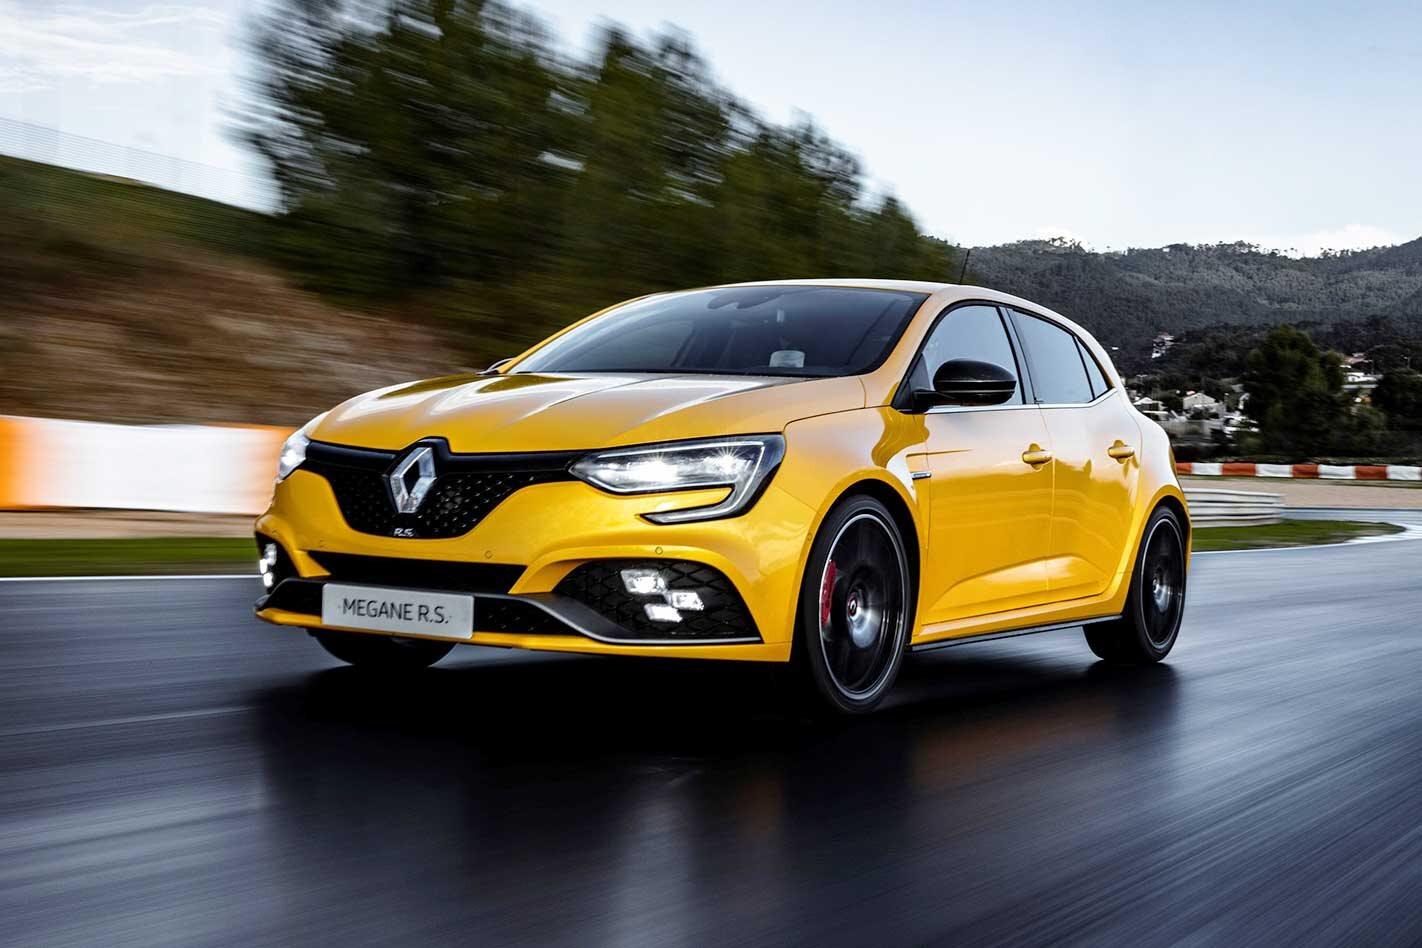 2019 Renault Megane RS 300 Trophy Performance Review Jpg